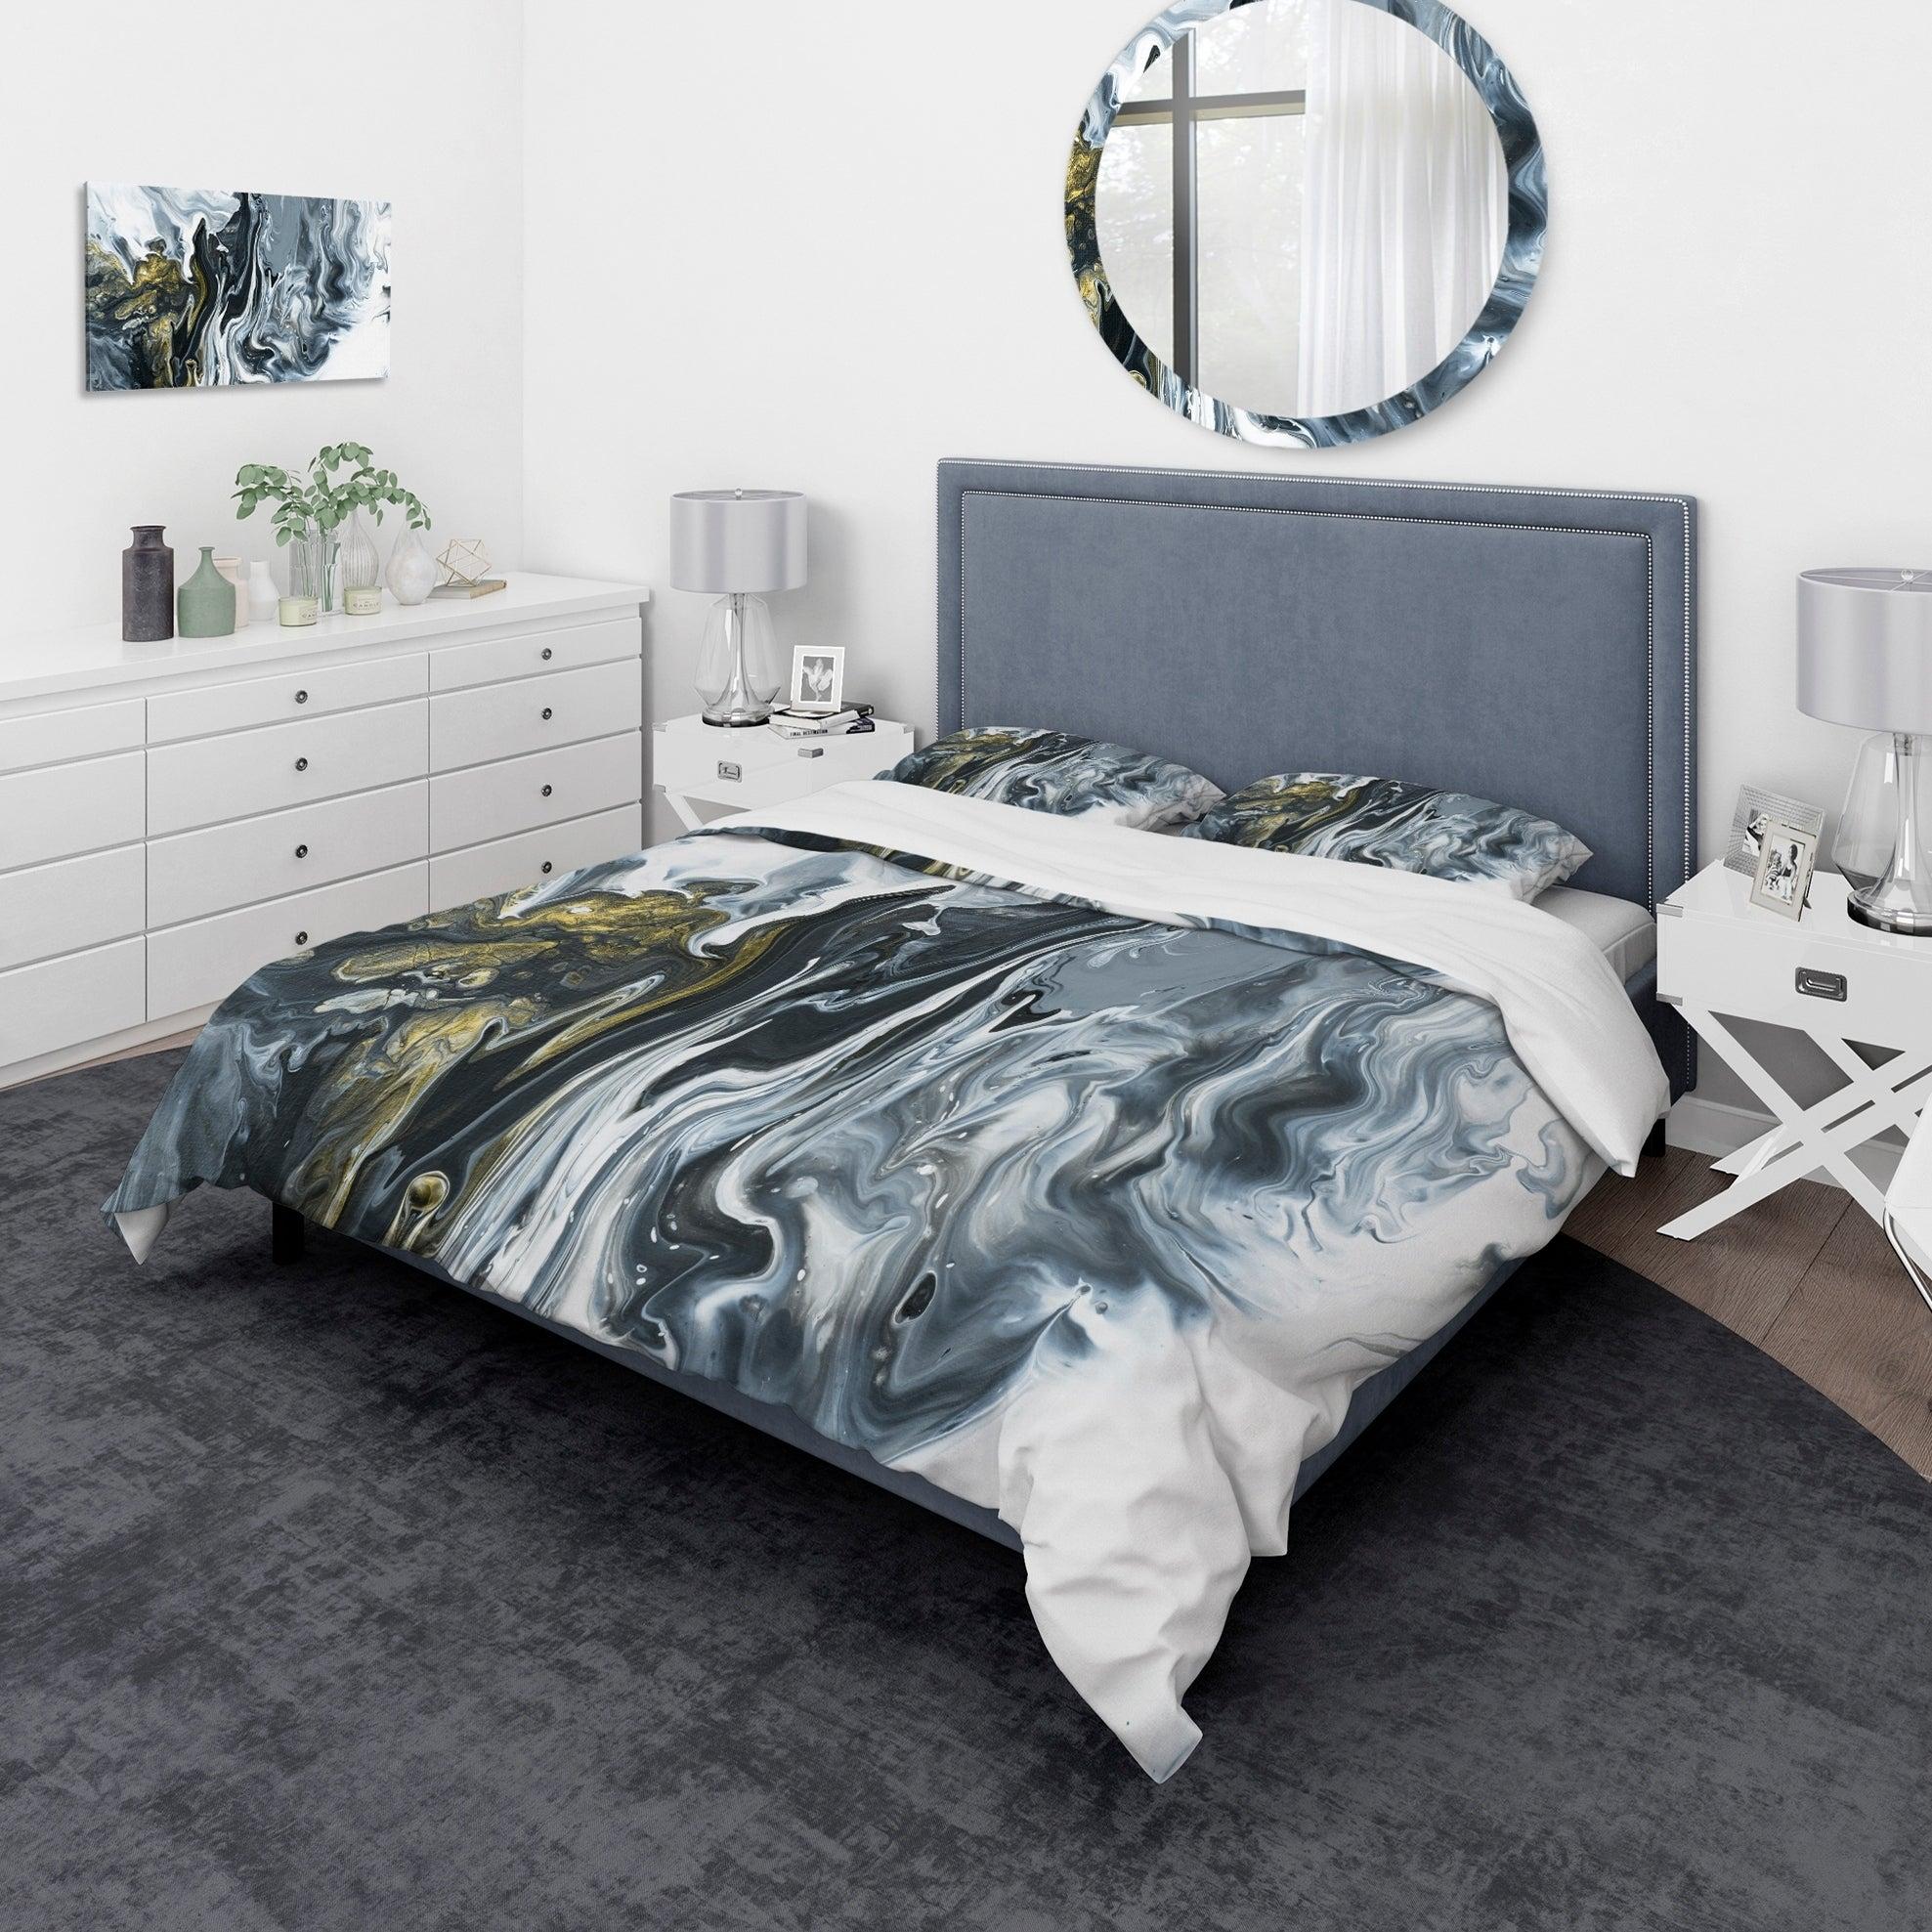 Designart White Grey And White Marble Acrylic Mid Century Modern Bedding Set Duvet Cover Shams Overstock 24240485